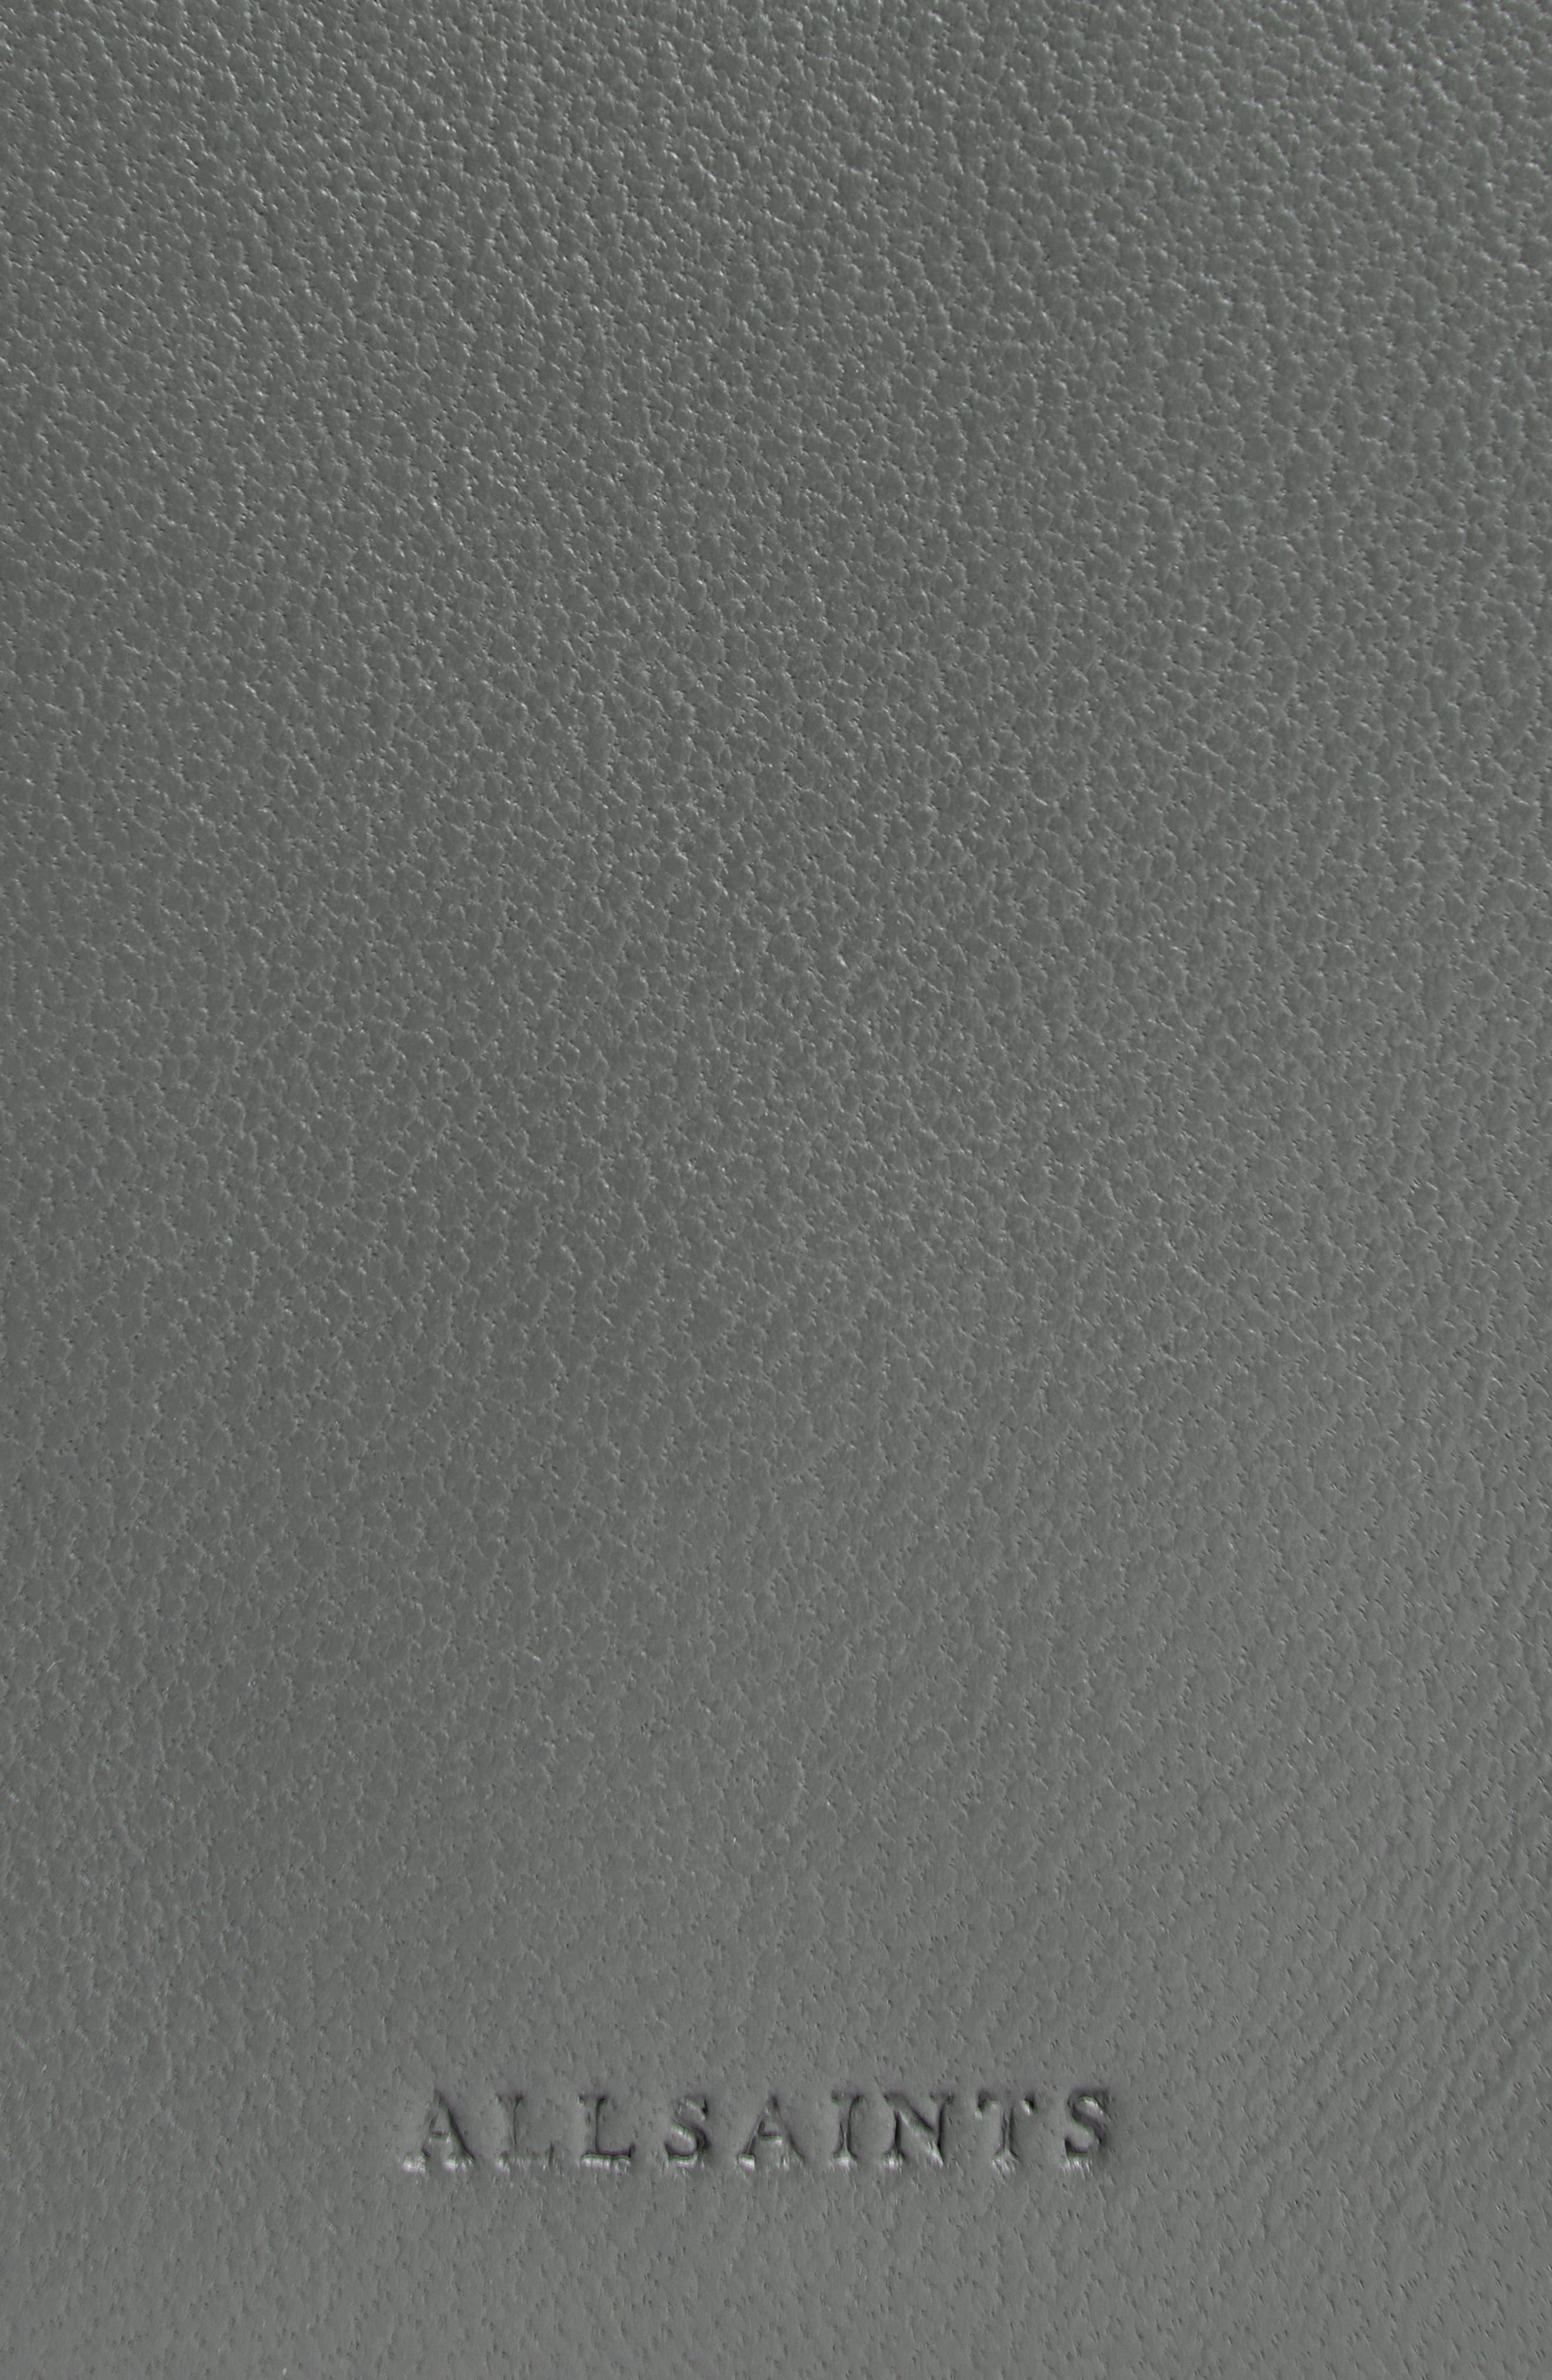 Zep Lambskin Leather Box Bag,                             Alternate thumbnail 9, color,                             SMOKY BLUE/ DARK BLUE